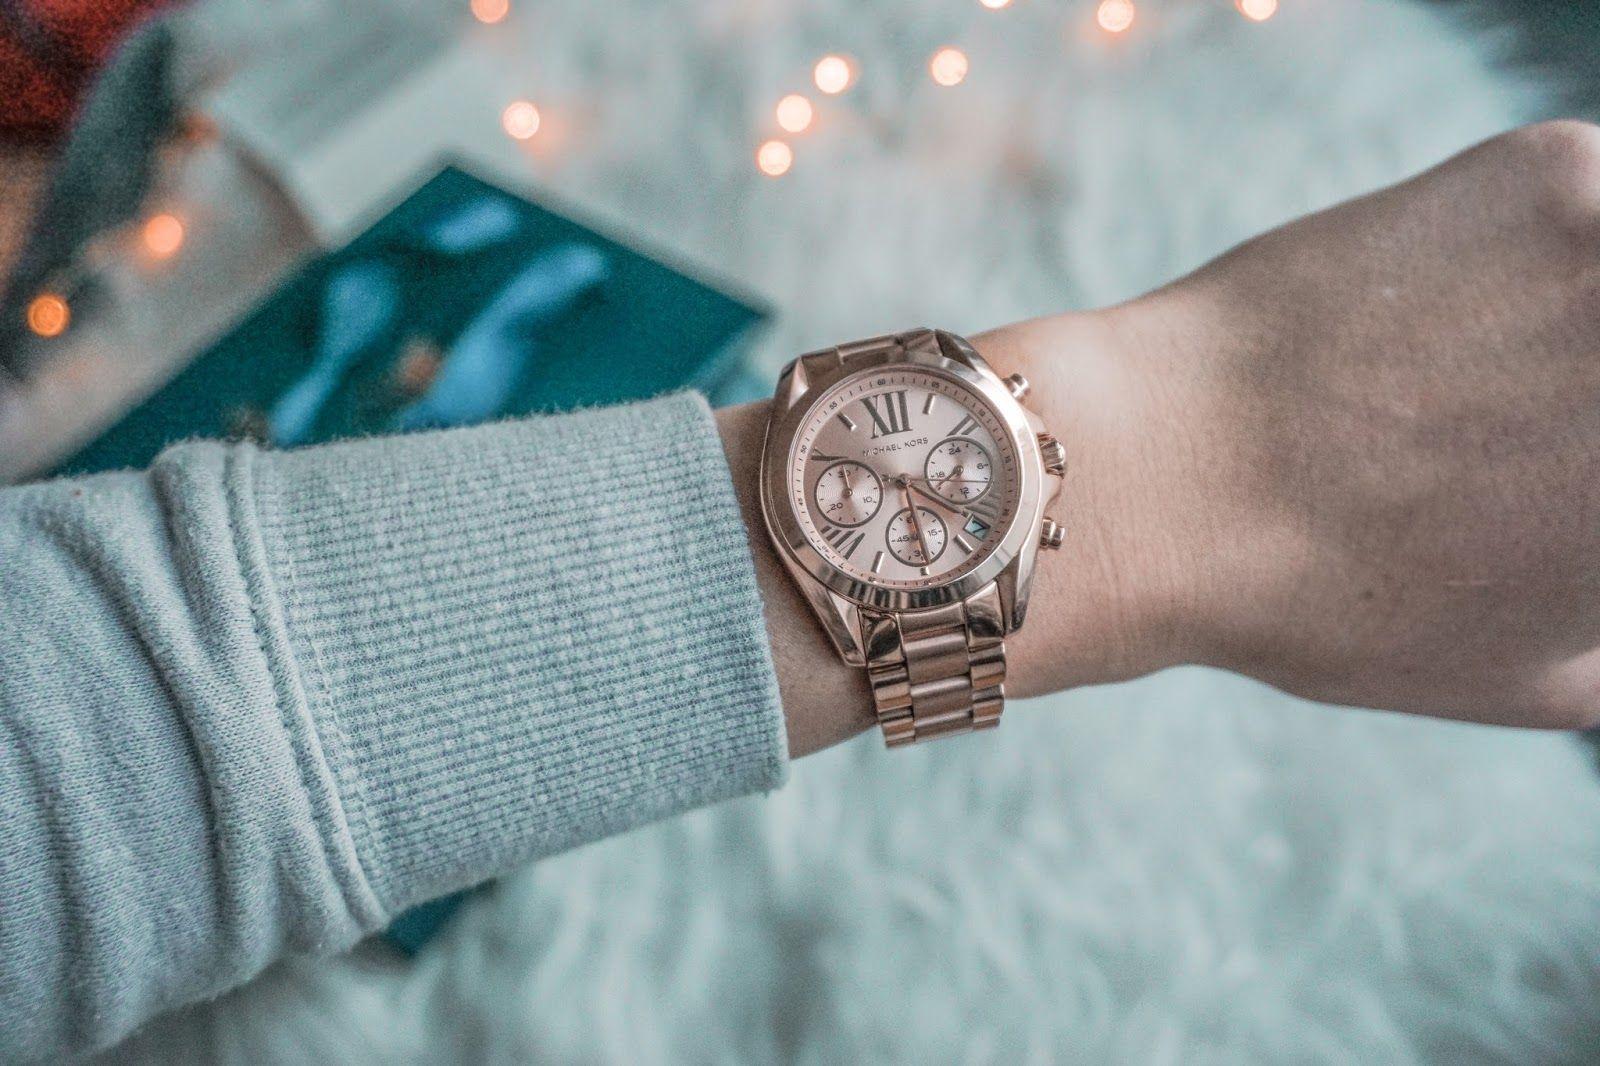 85a72da4 Watch Michael Kors bradshaw mini Rose Gold / fashion, jewellery  #GoldJewelleryMichaelKors